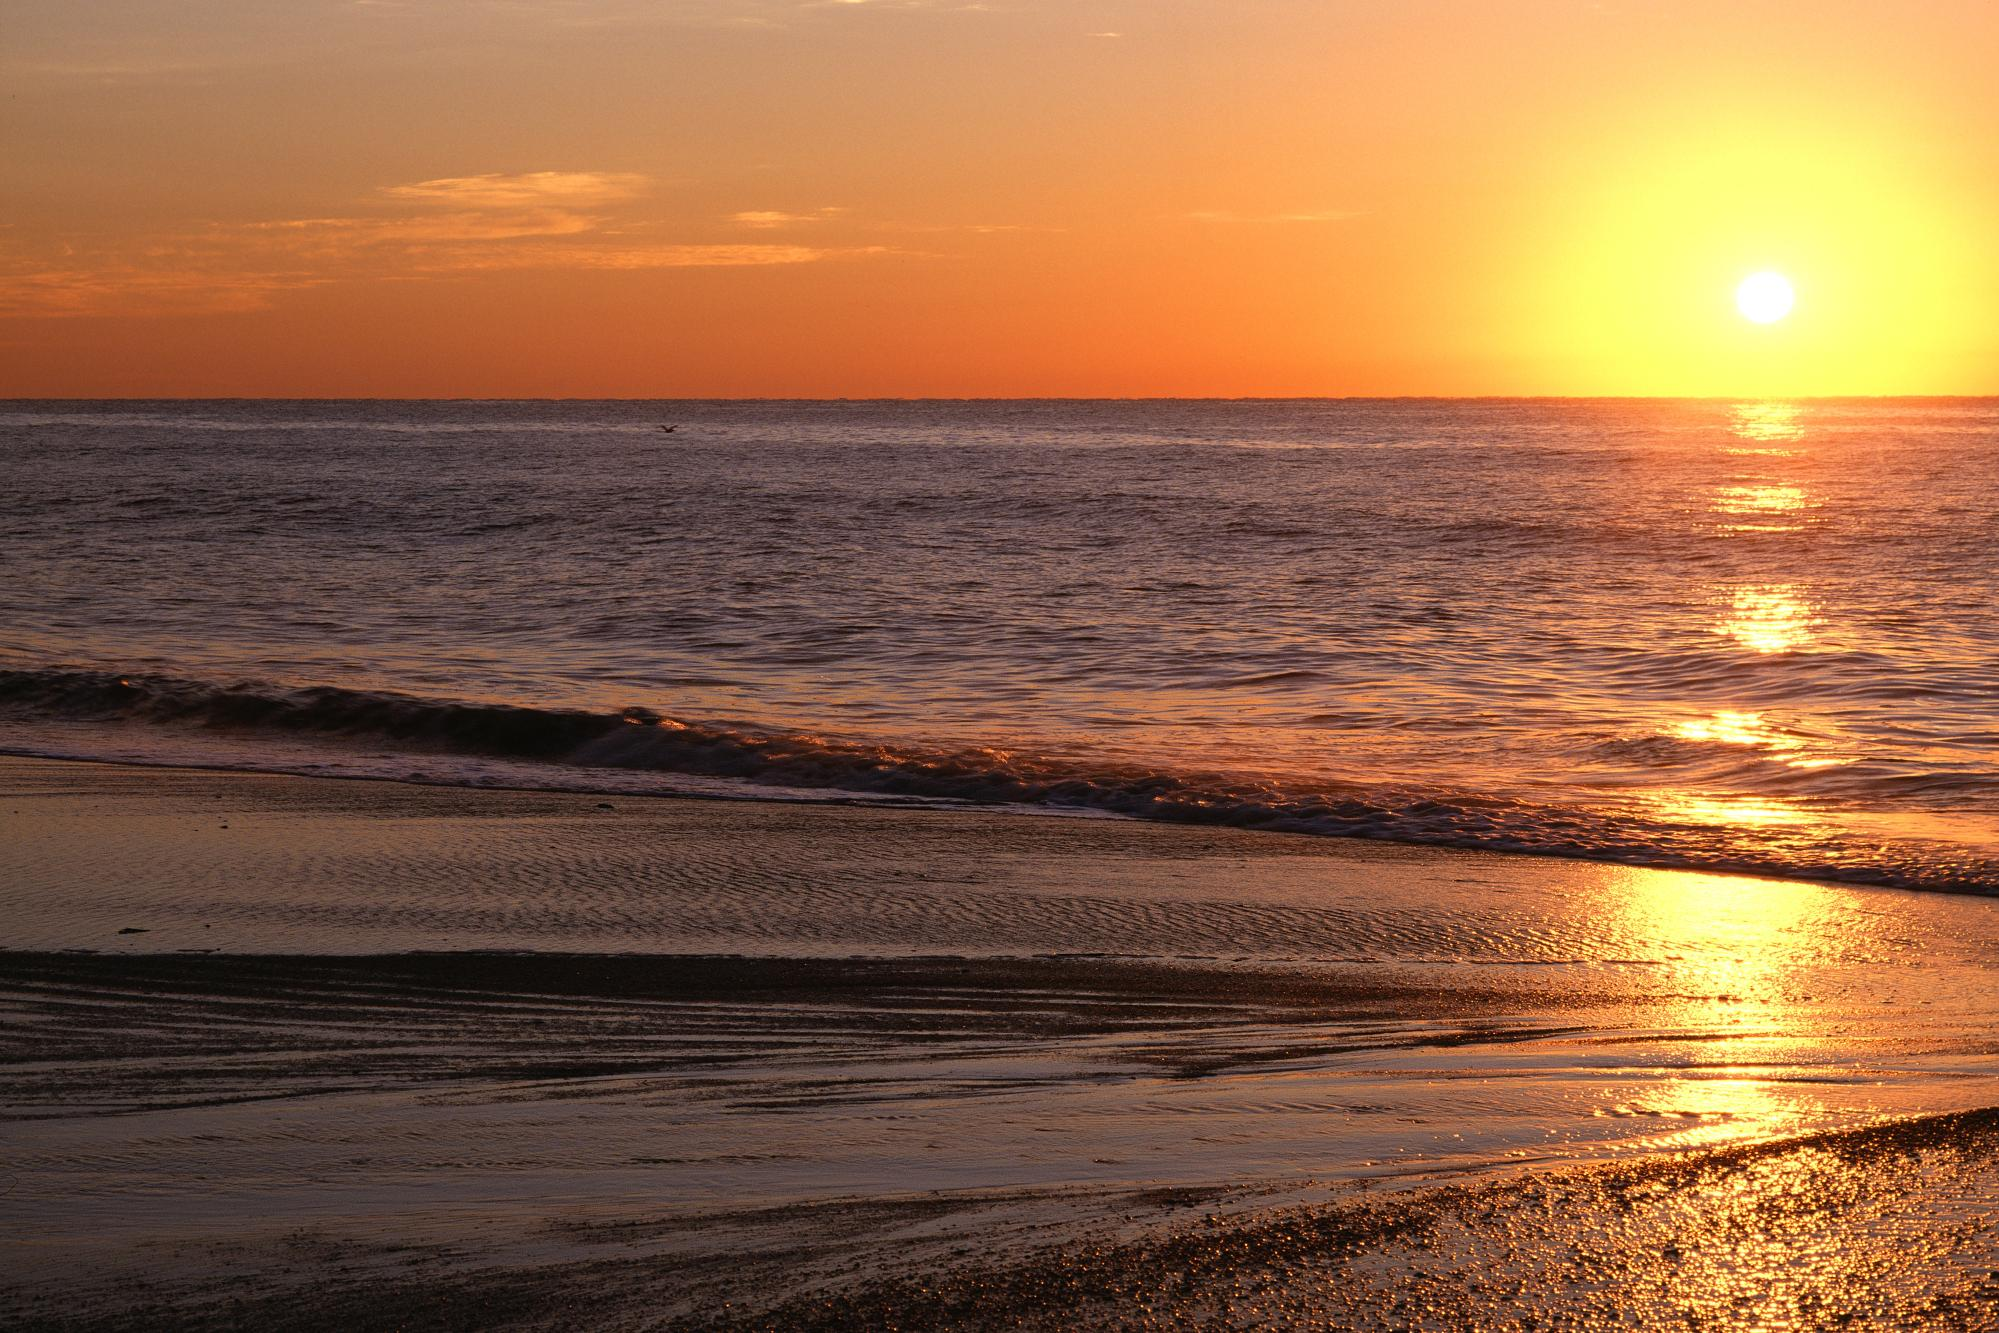 Sunrise Over the Atlantic, Myrtle Beach, South Carolina